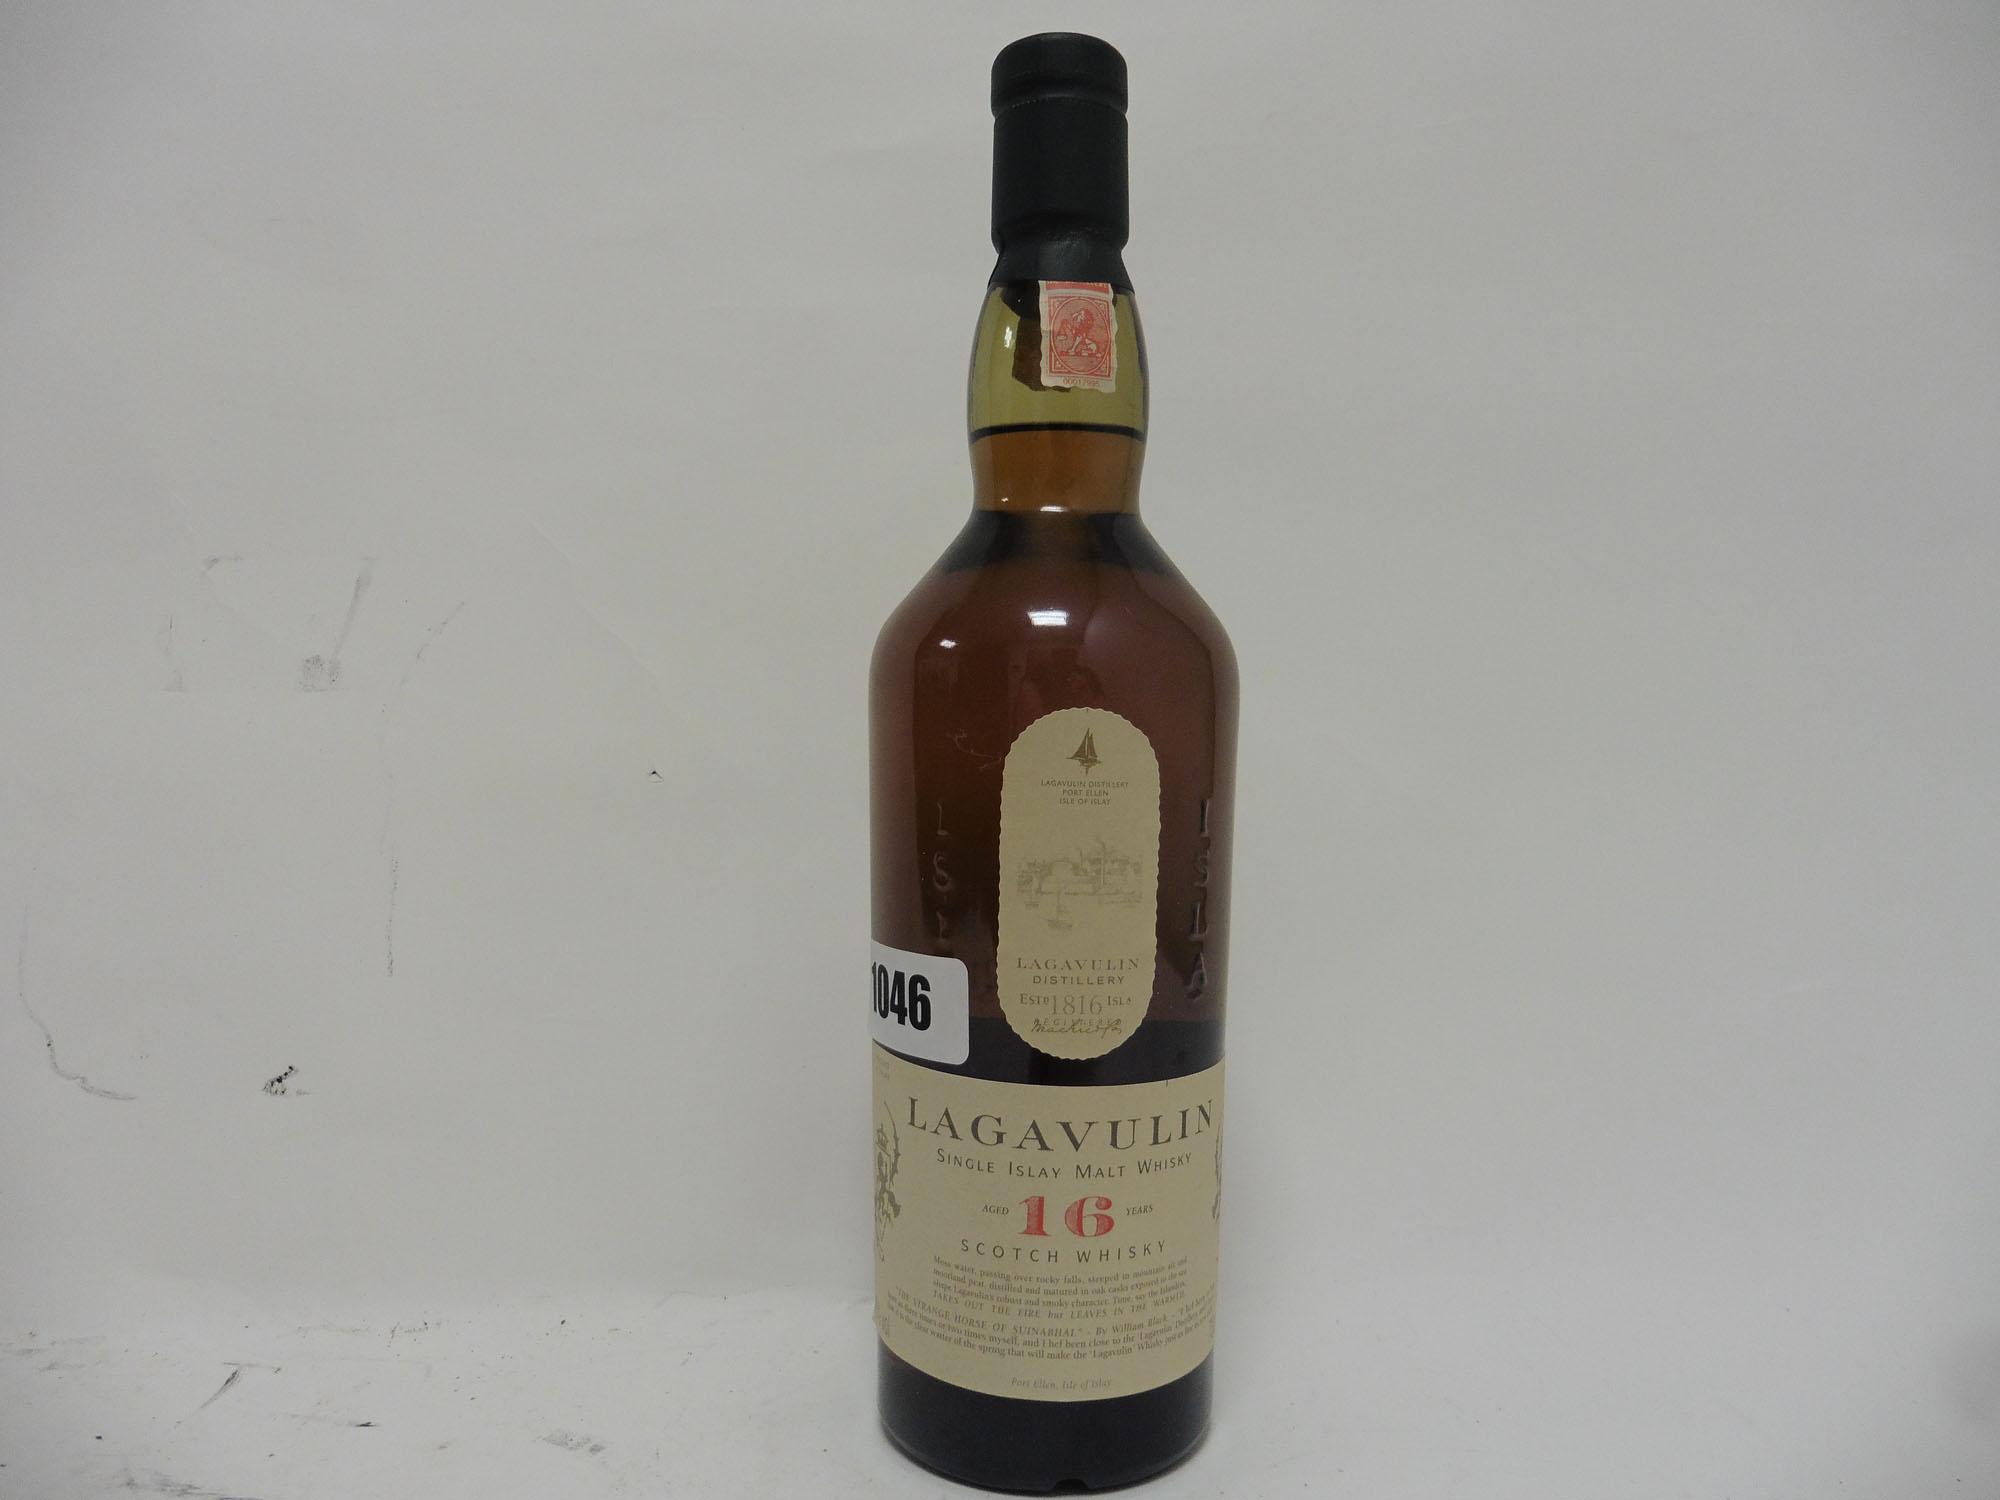 A bottle of Lagavulin 16 year old Single Islay Malt Scotch Whisky 70cl 43%